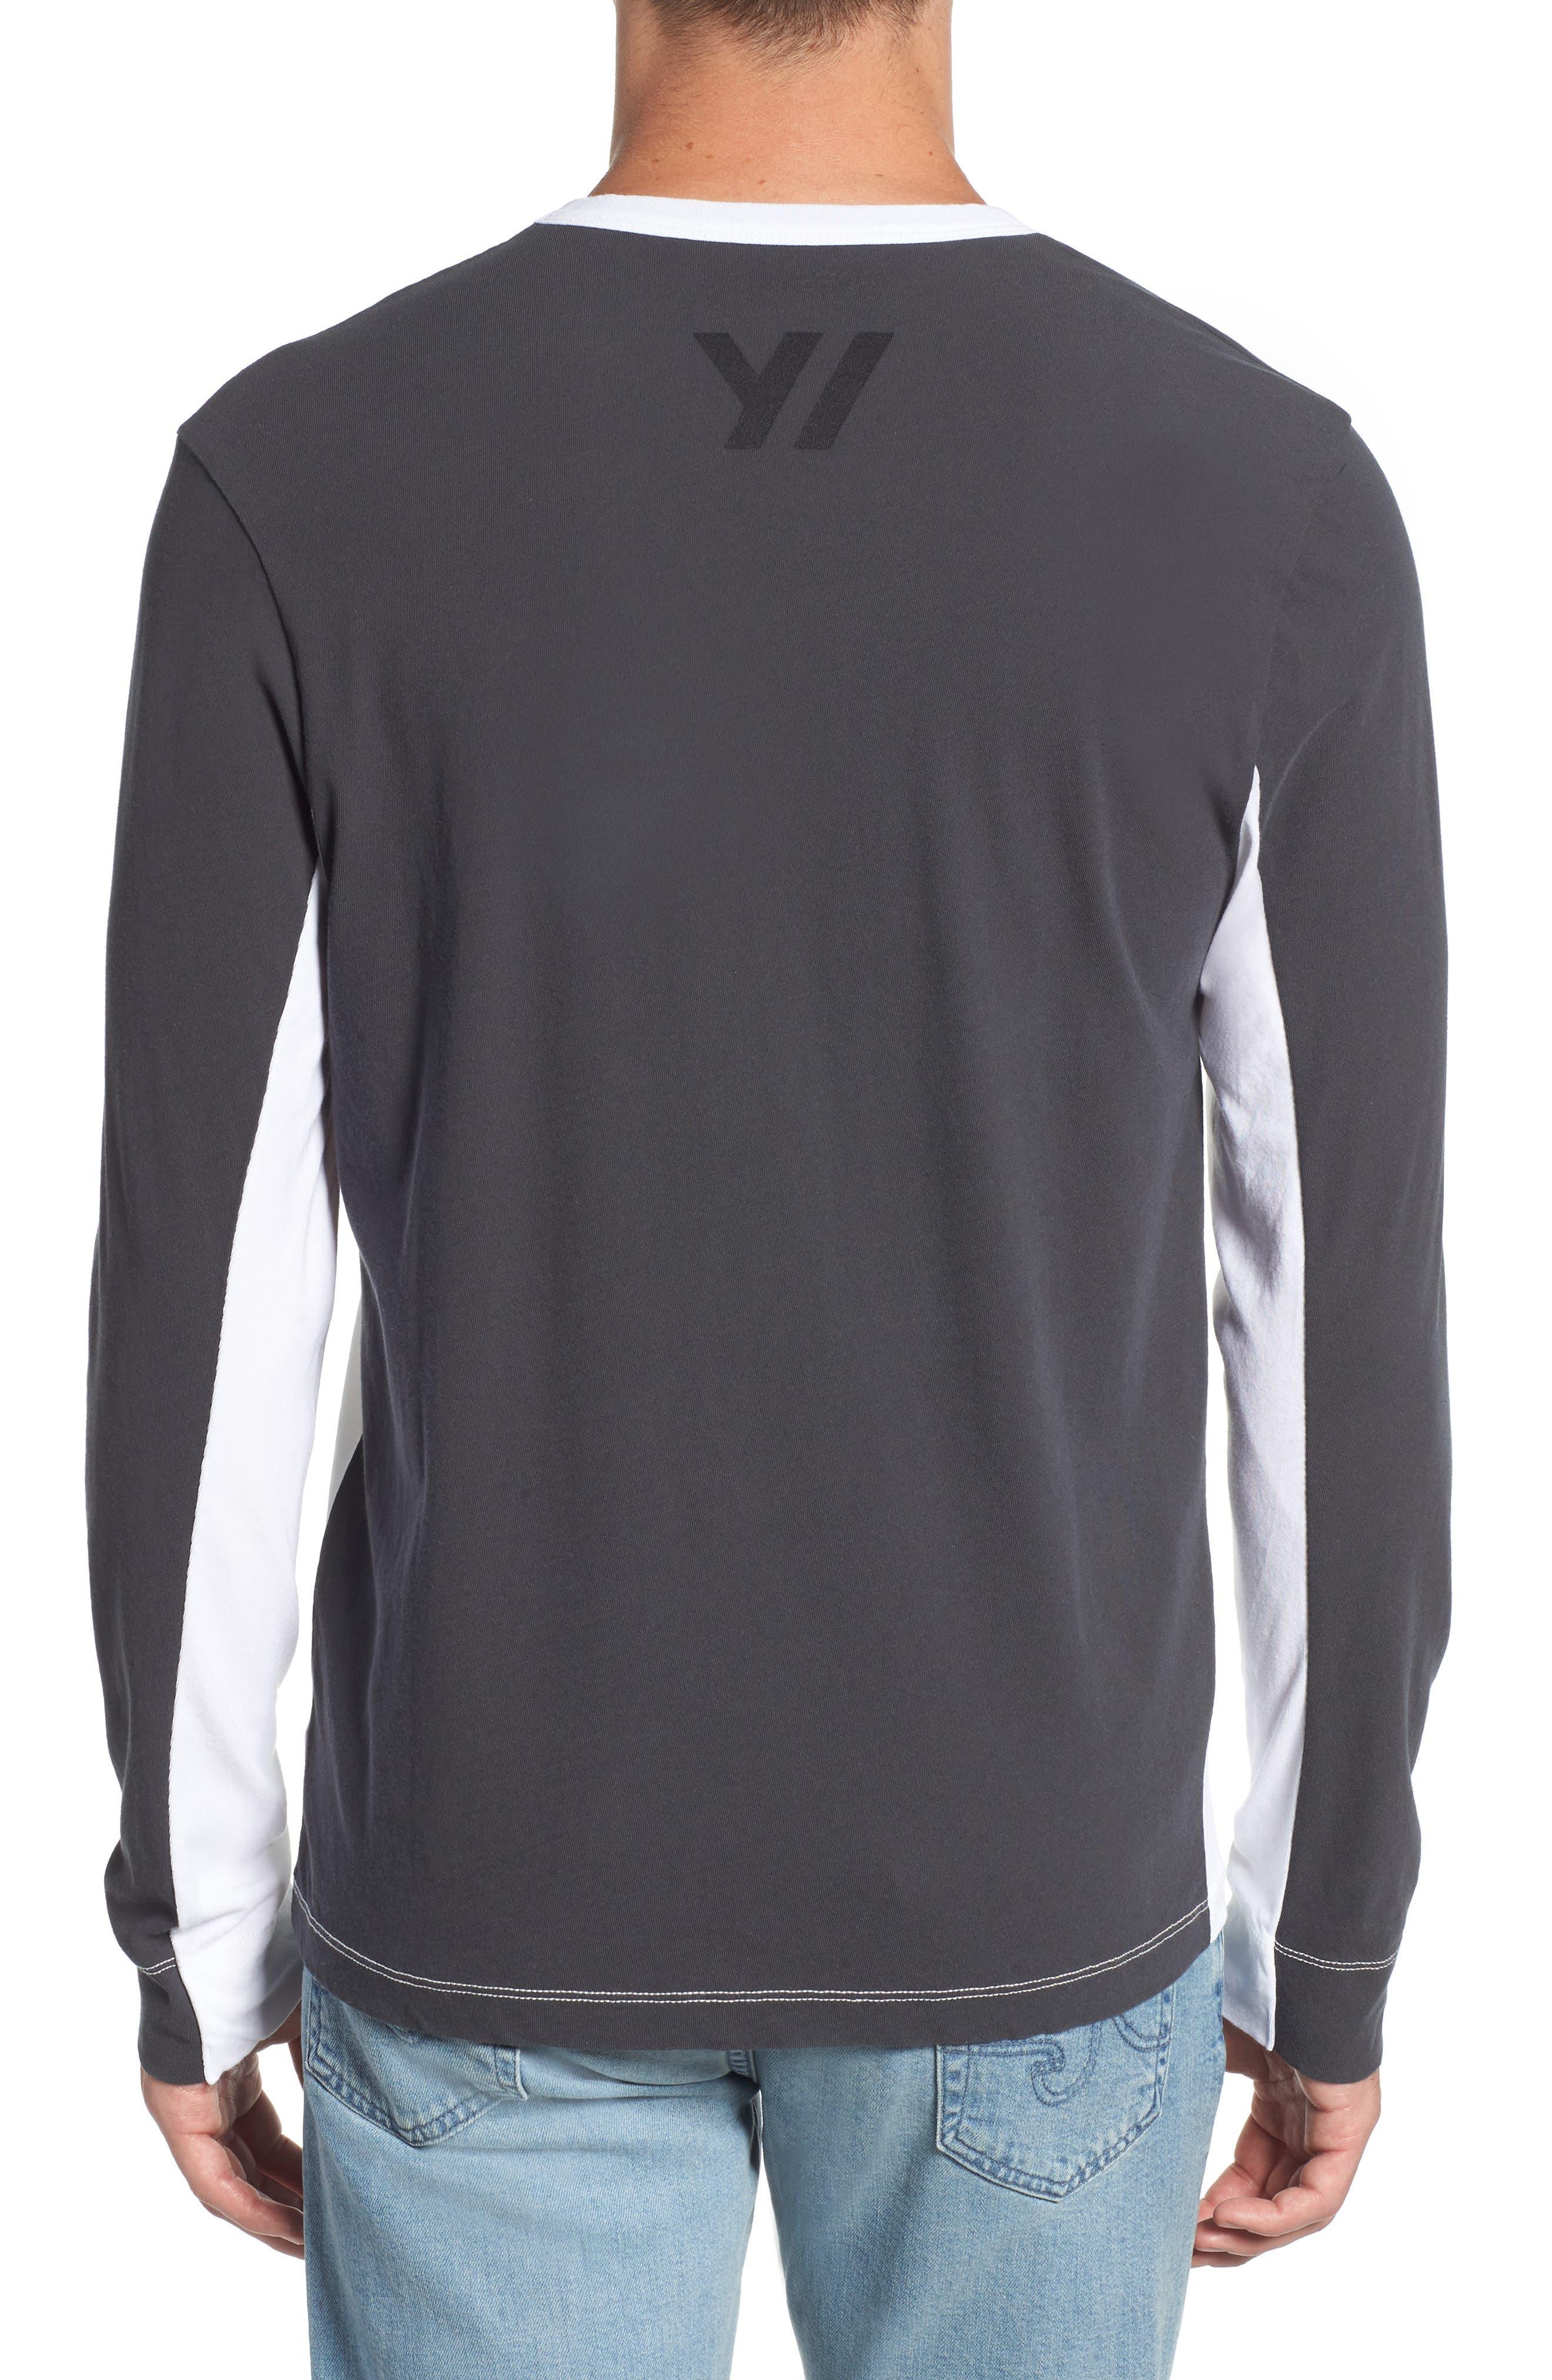 Colorblock Motocross Shirt,                             Alternate thumbnail 2, color,                             Carbon White